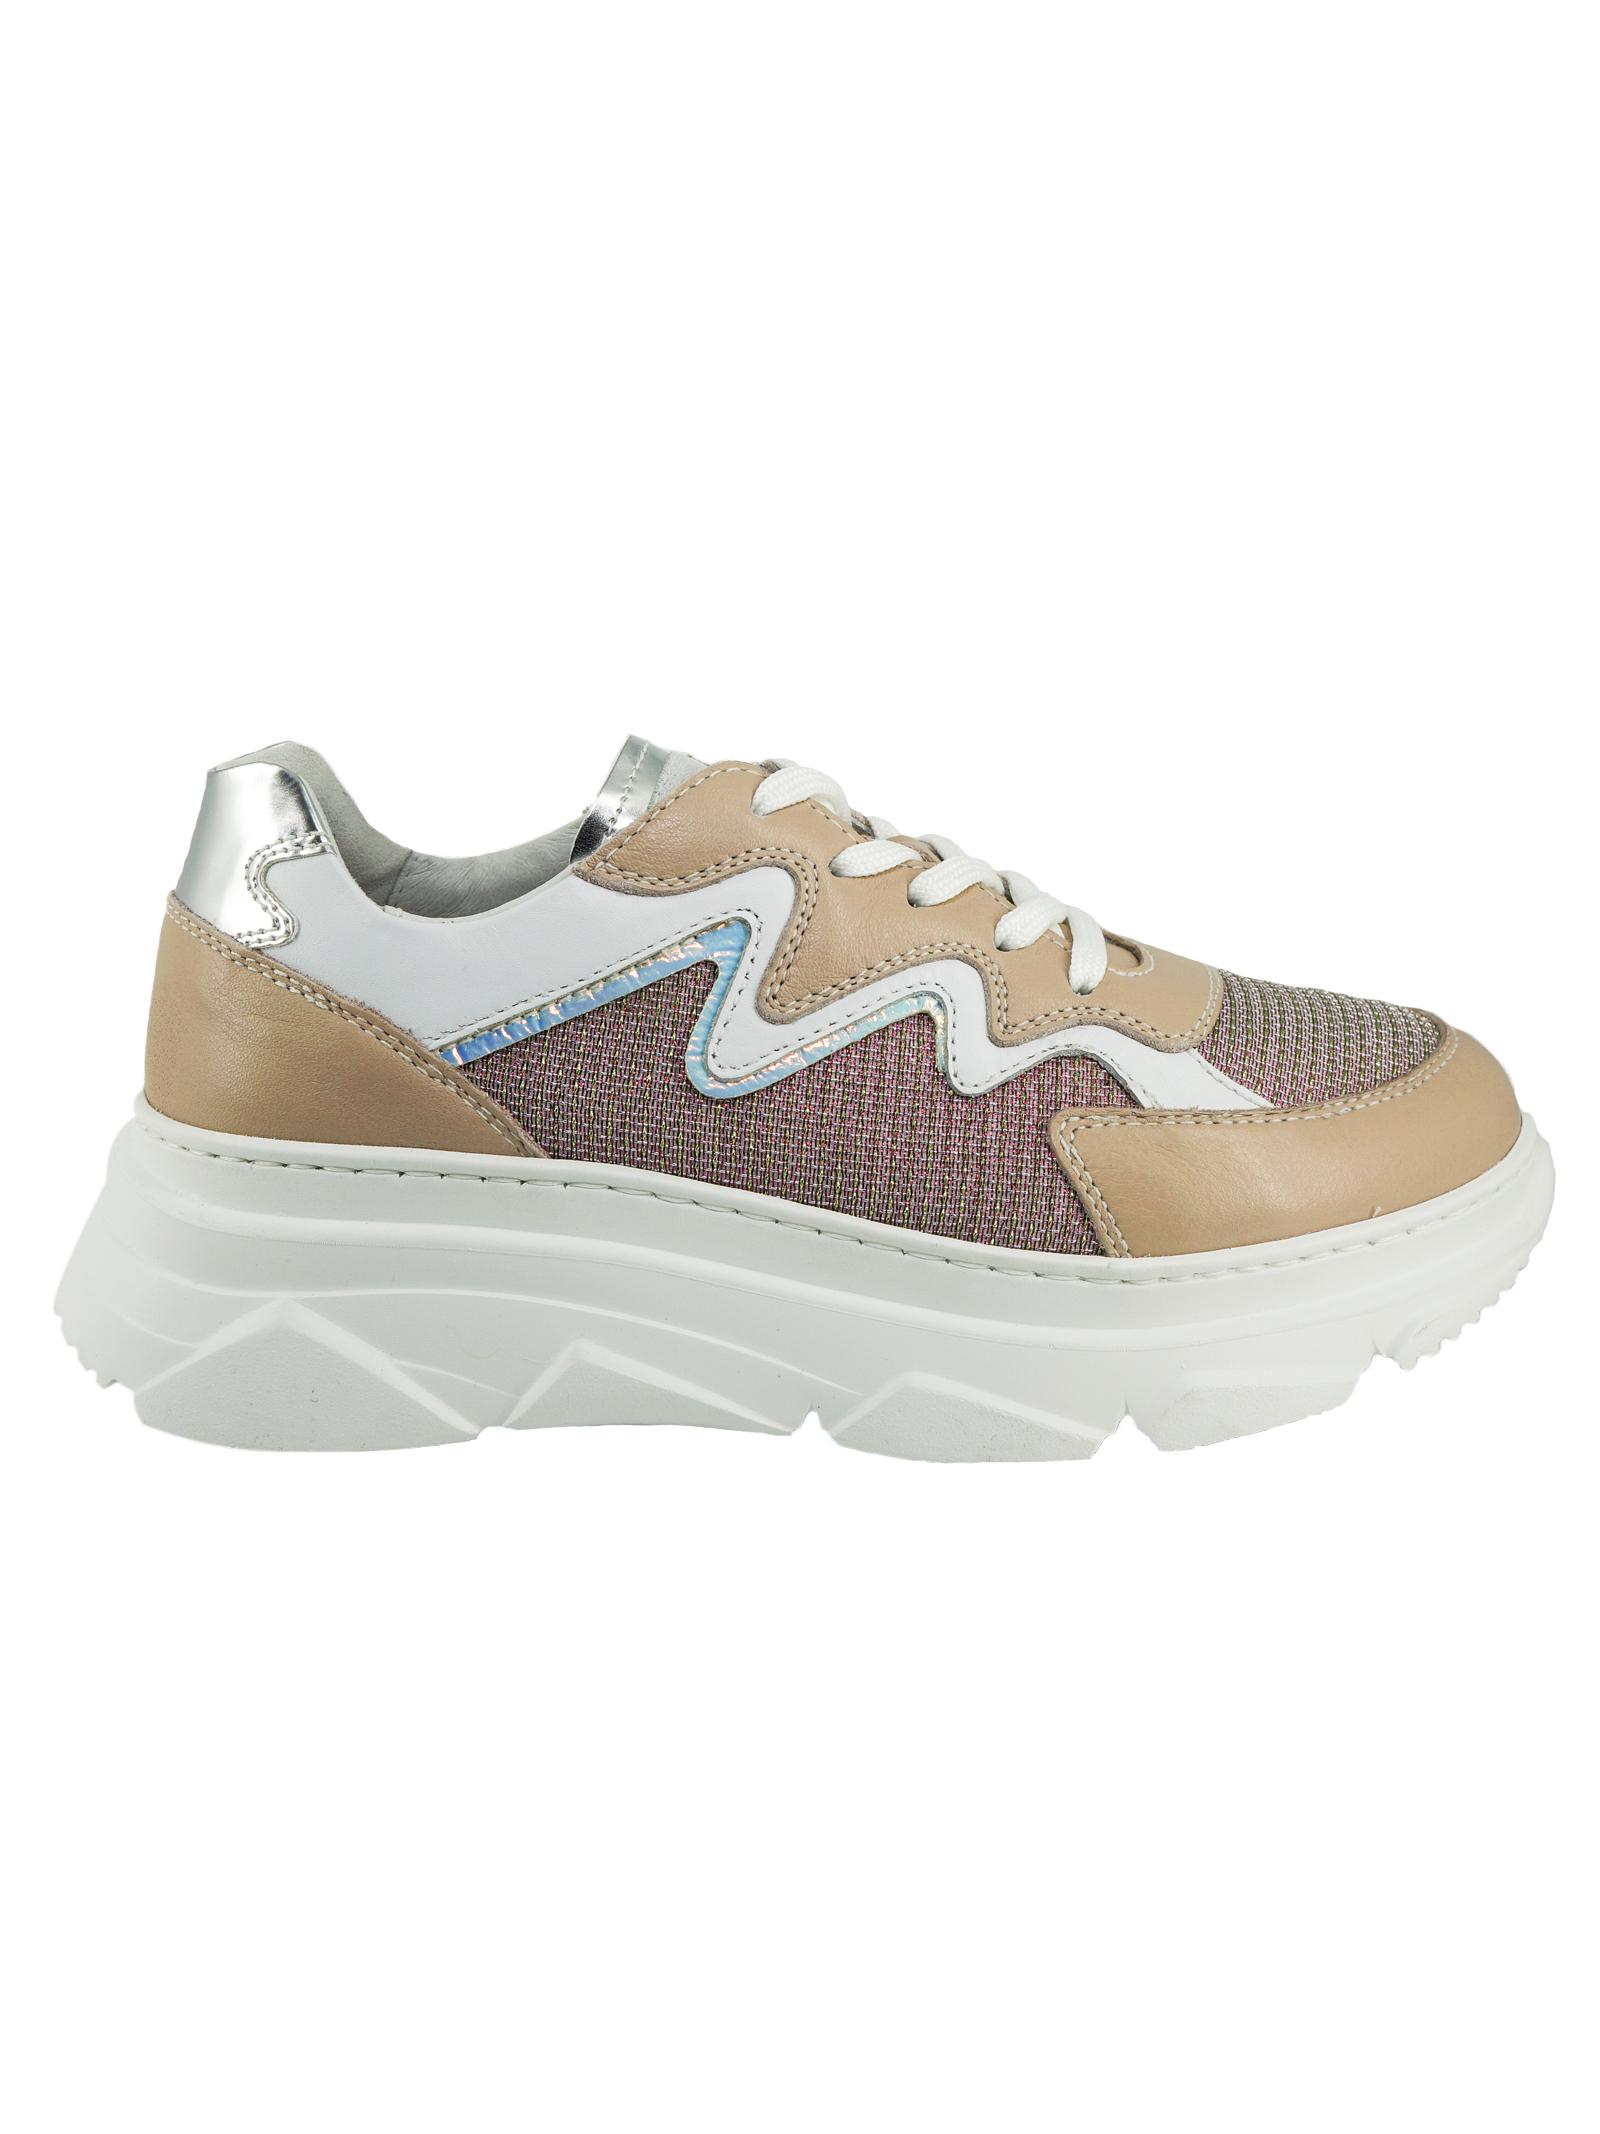 Sneaker Donna in pelle Nero Giardini Nero Giardini | Sneakers | E115310DCARNE631